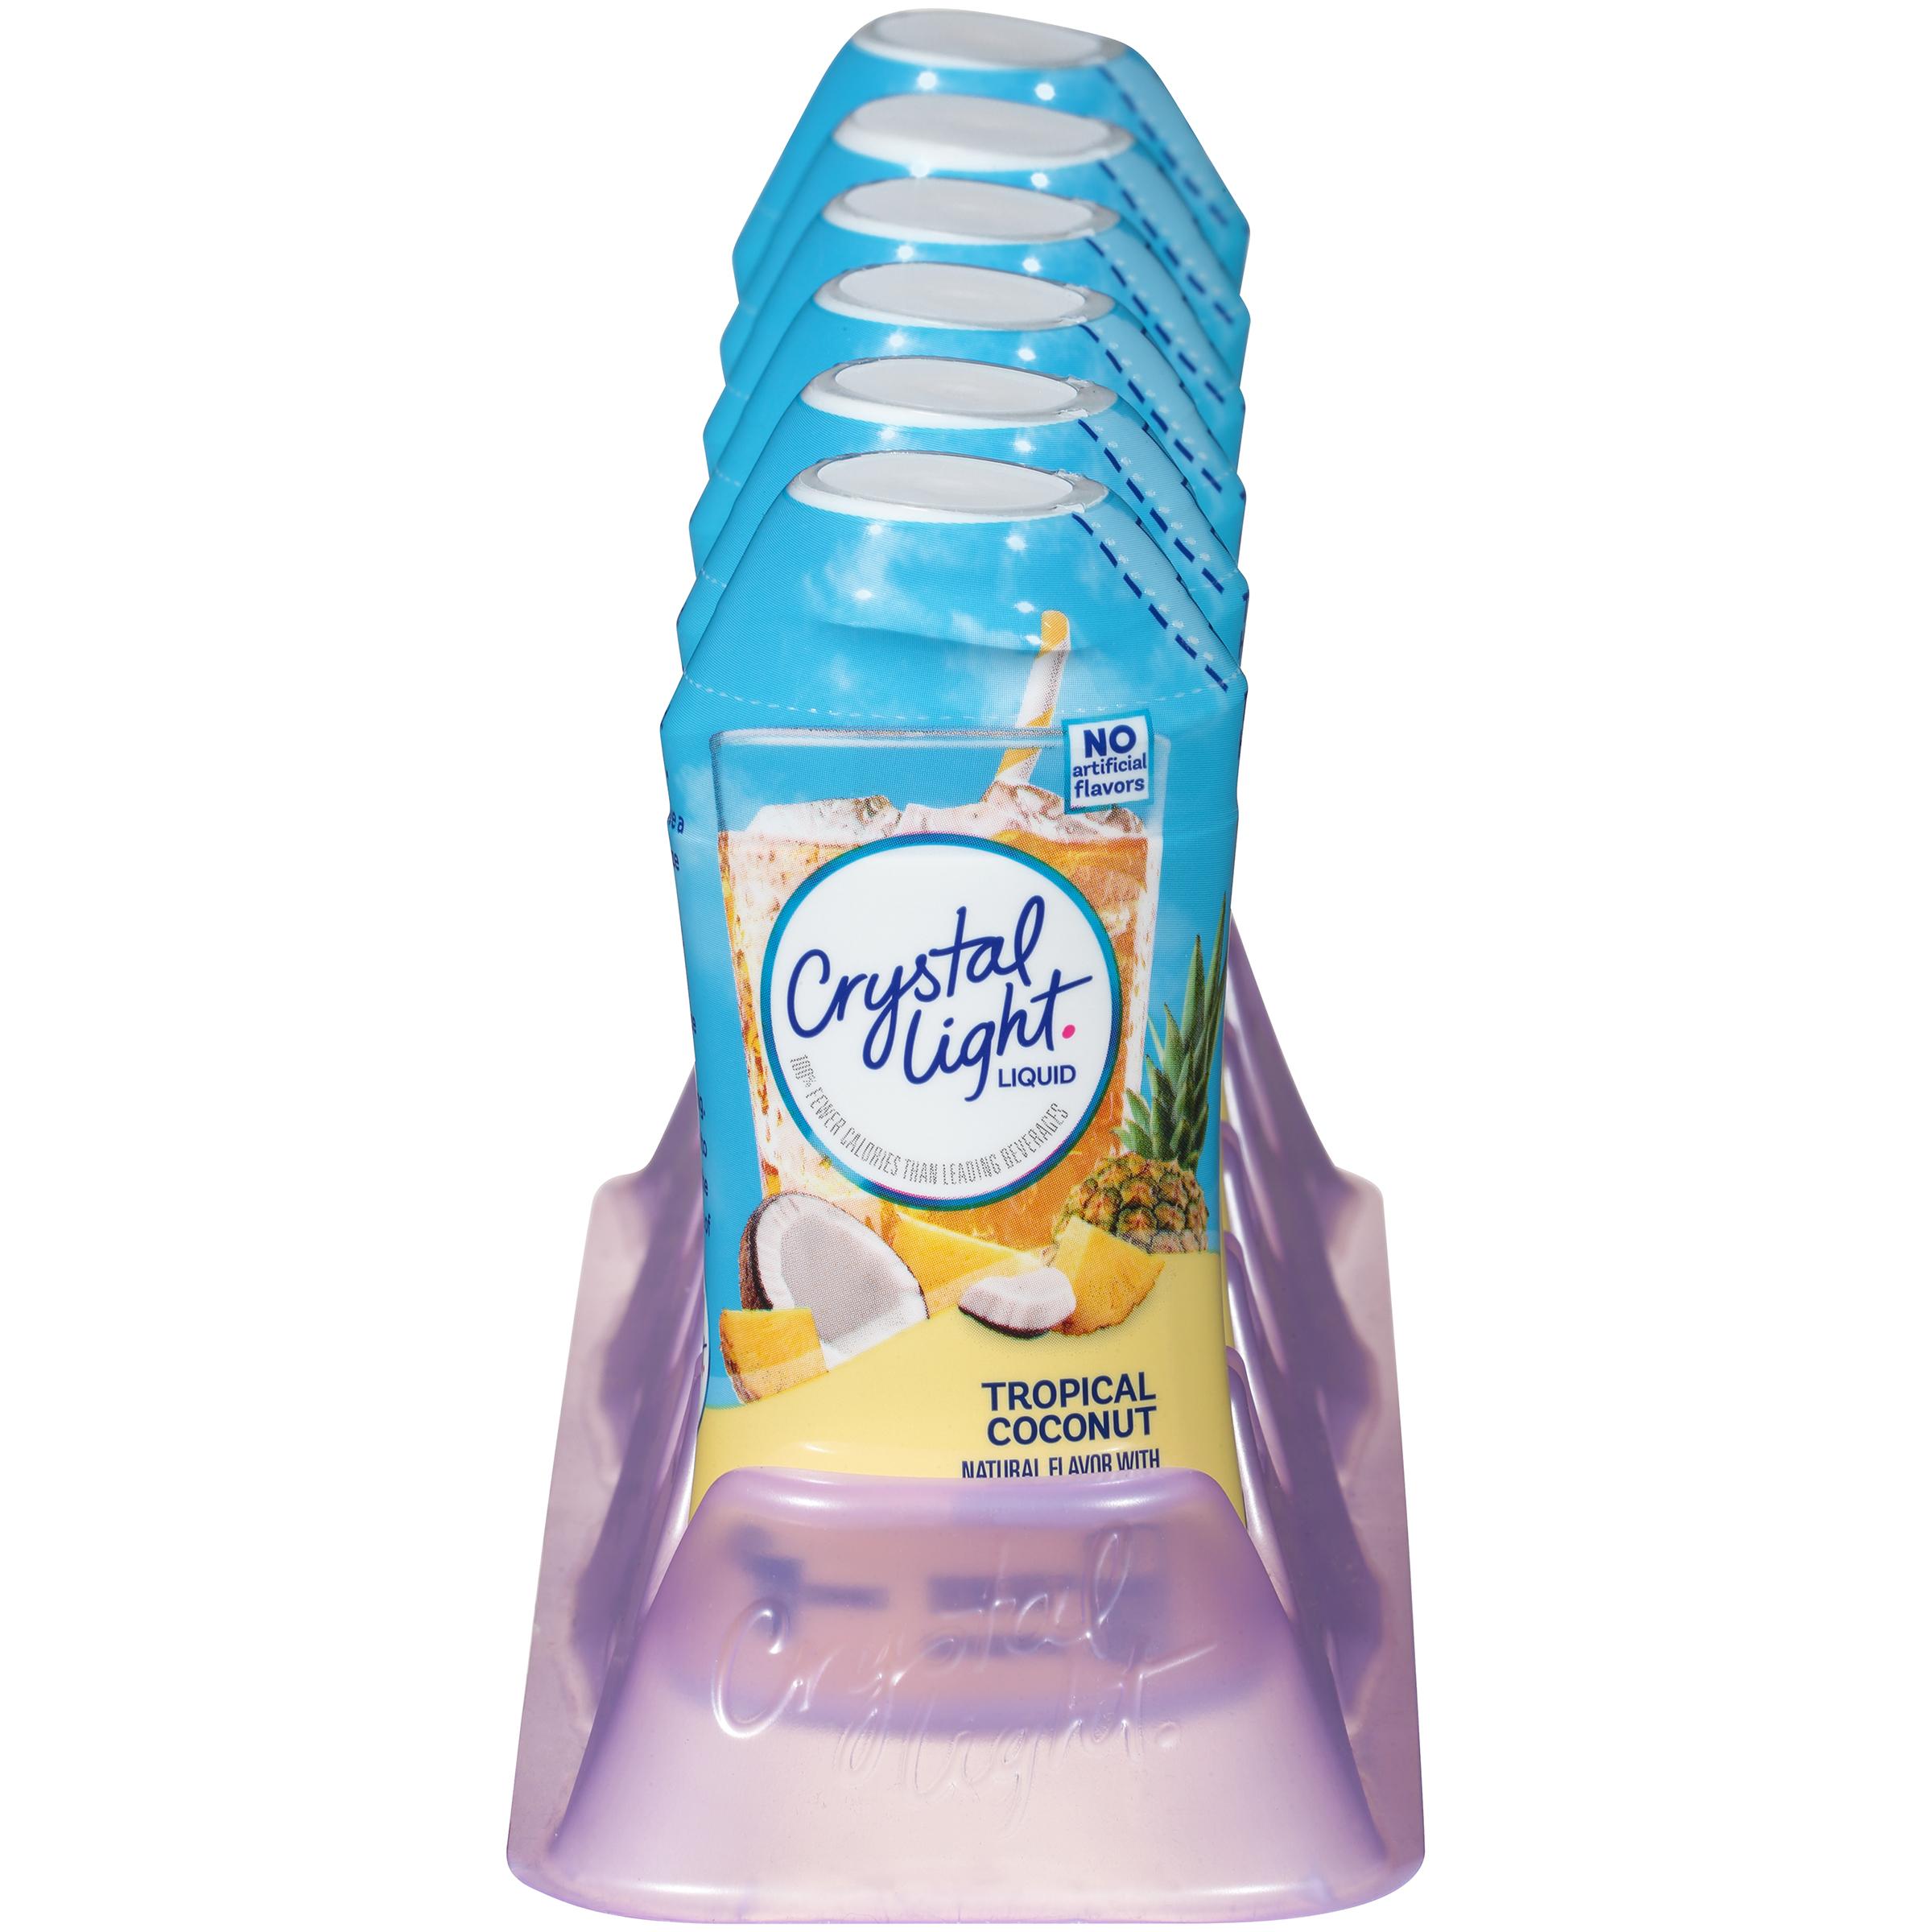 Crystal Light Liquid Tropical Coconut Drink Mix, 1.62 Fl